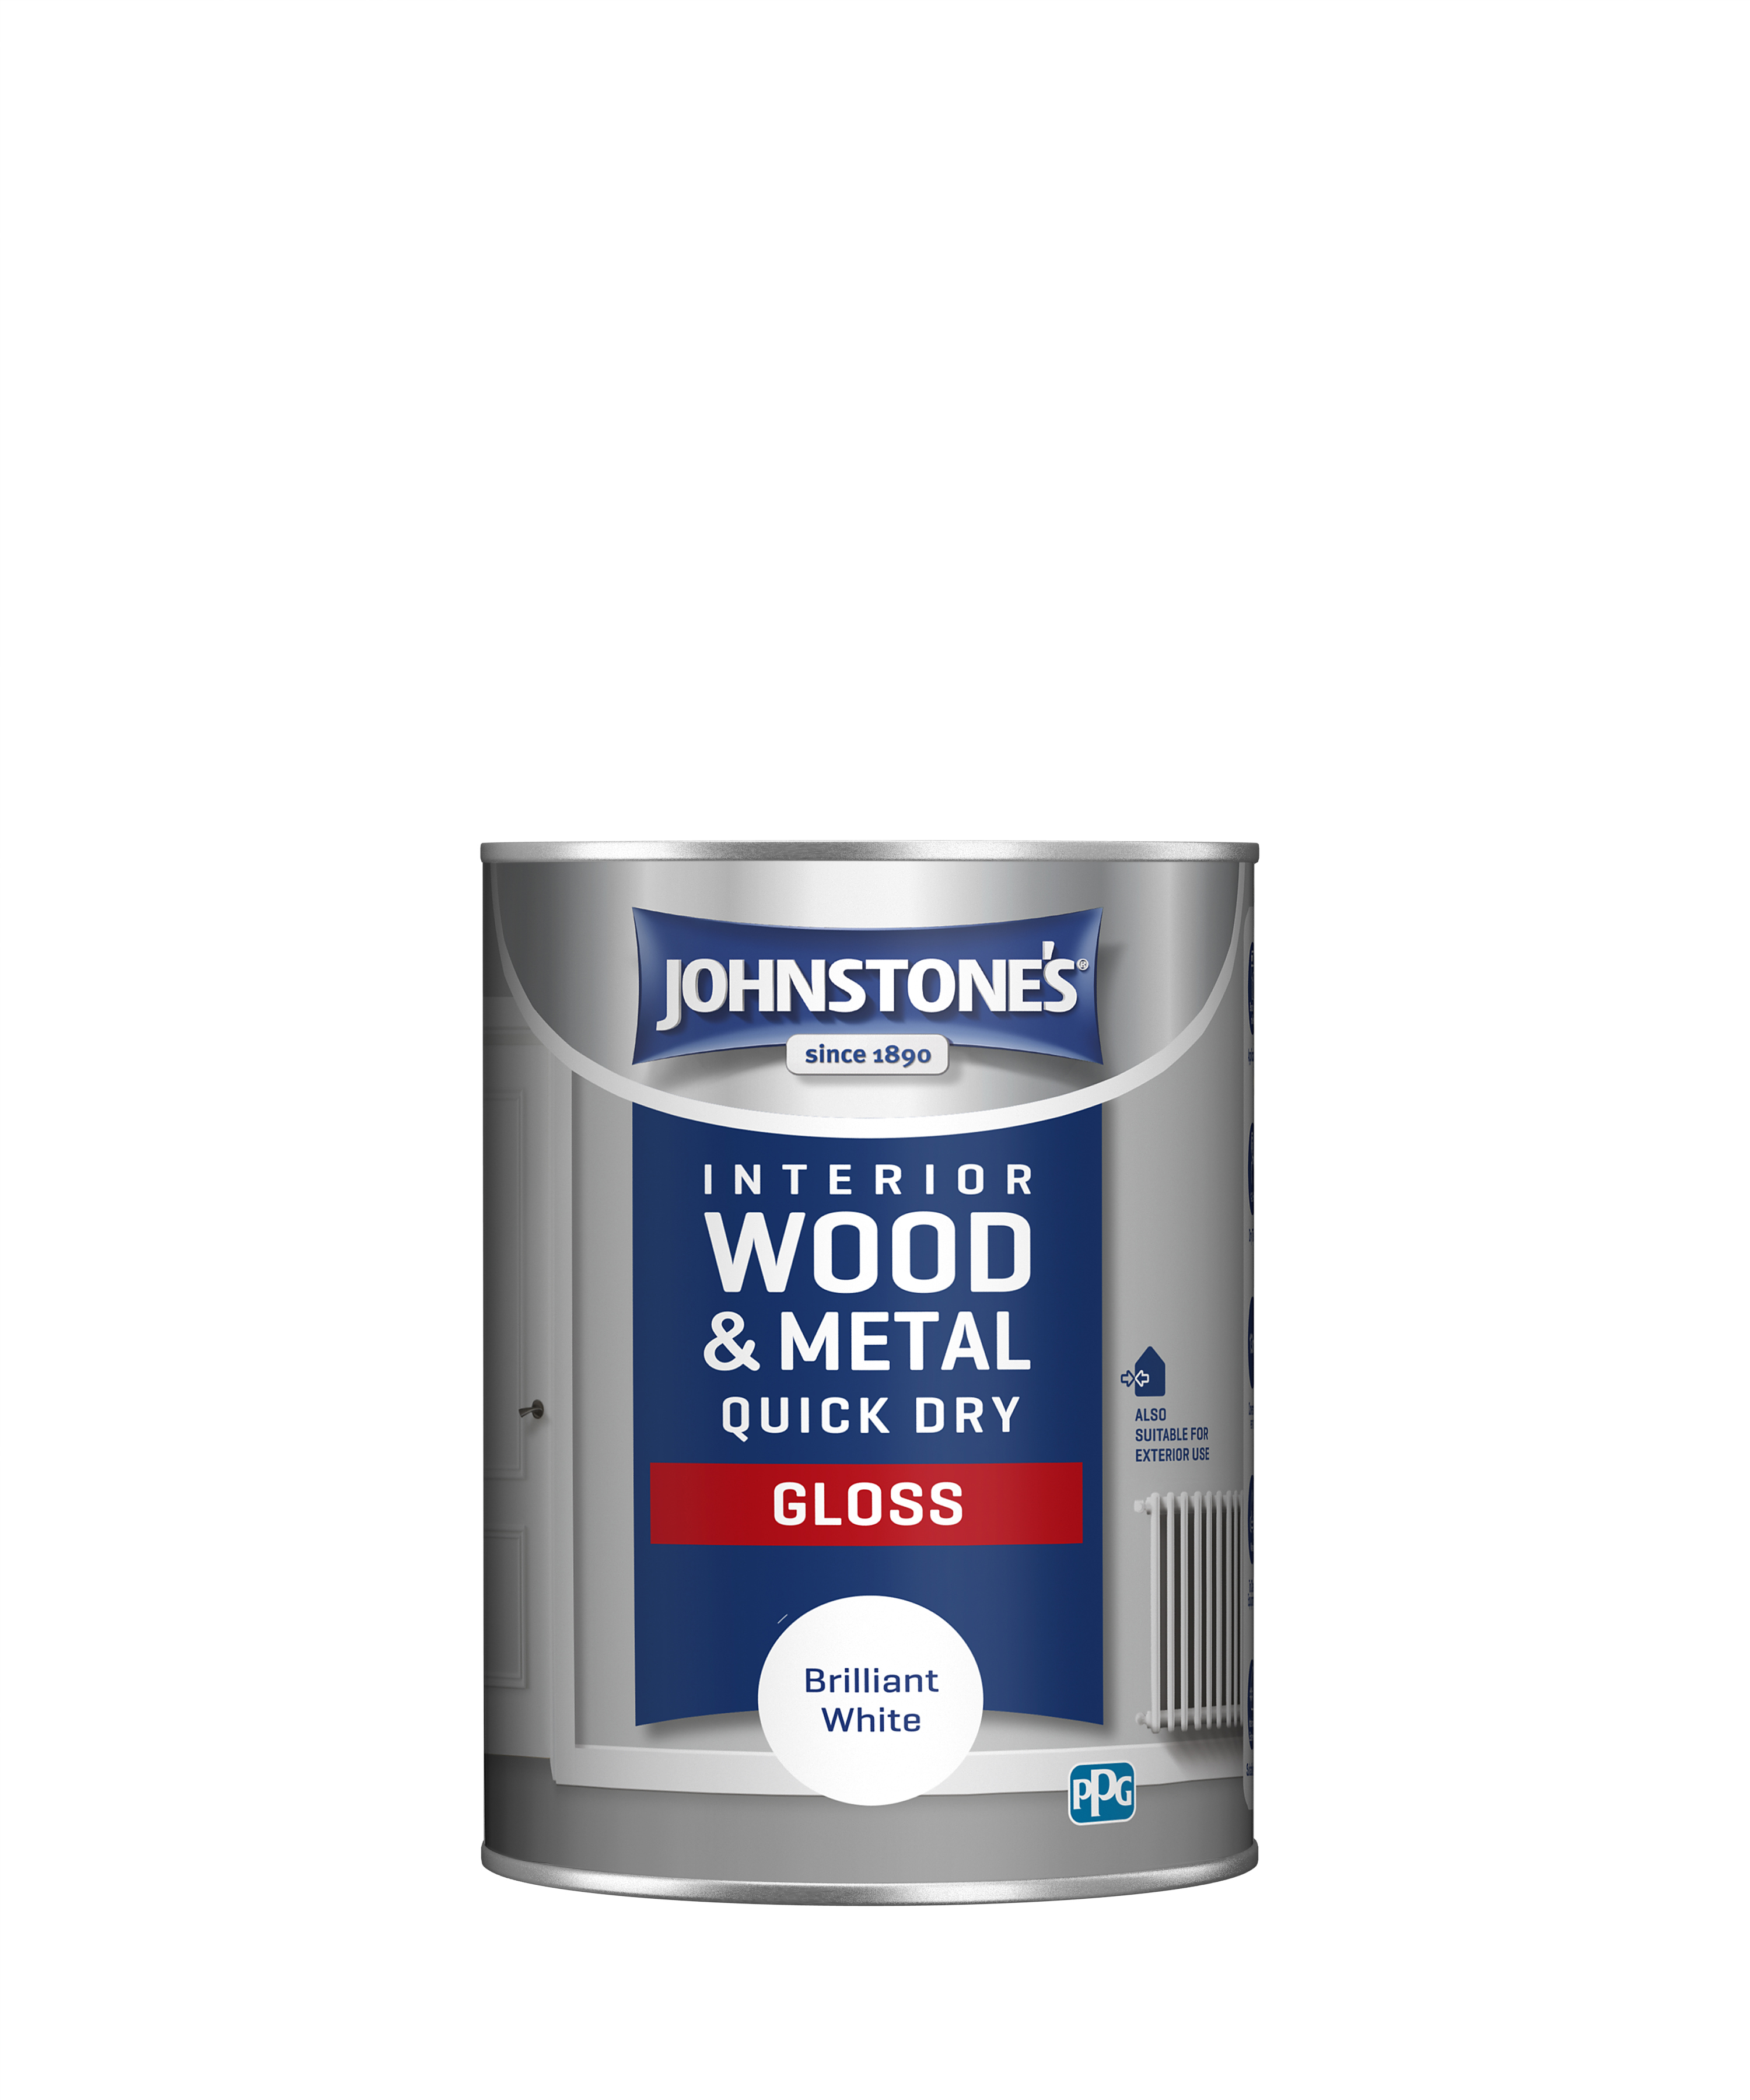 Johnstones 1.25 Litre Quick Dry Gloss Paint - Brilliant White